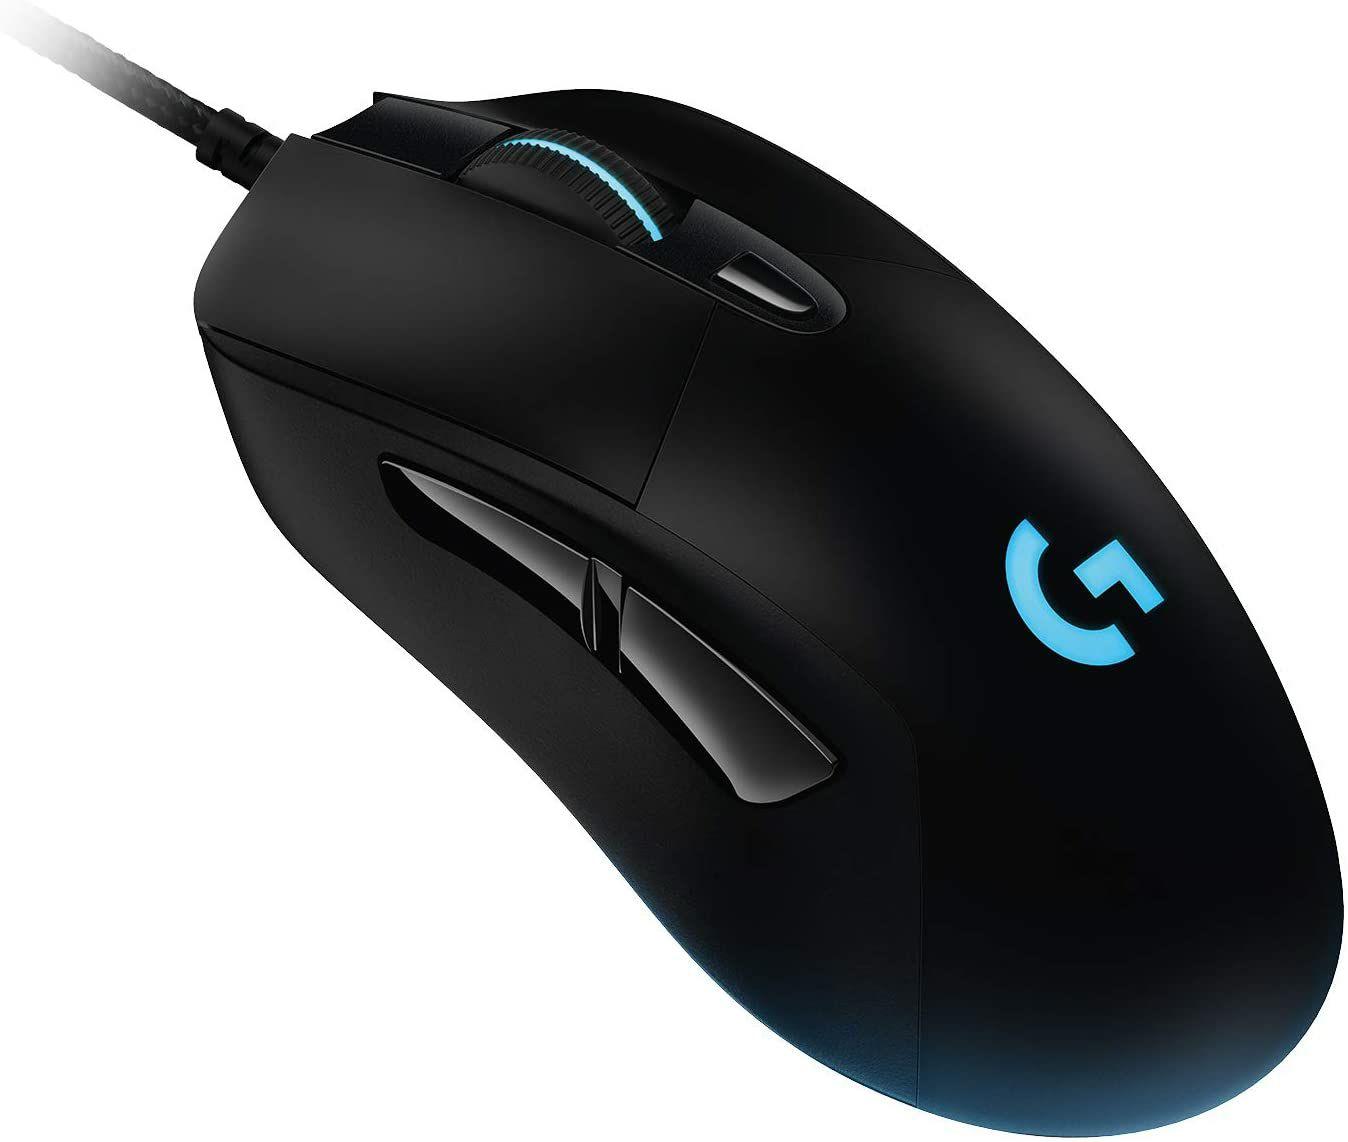 Logitech G403 Hero Wired Gaming Mouse, Hero 16K Sensor, 16000 DPI £44.89 @ Amazon